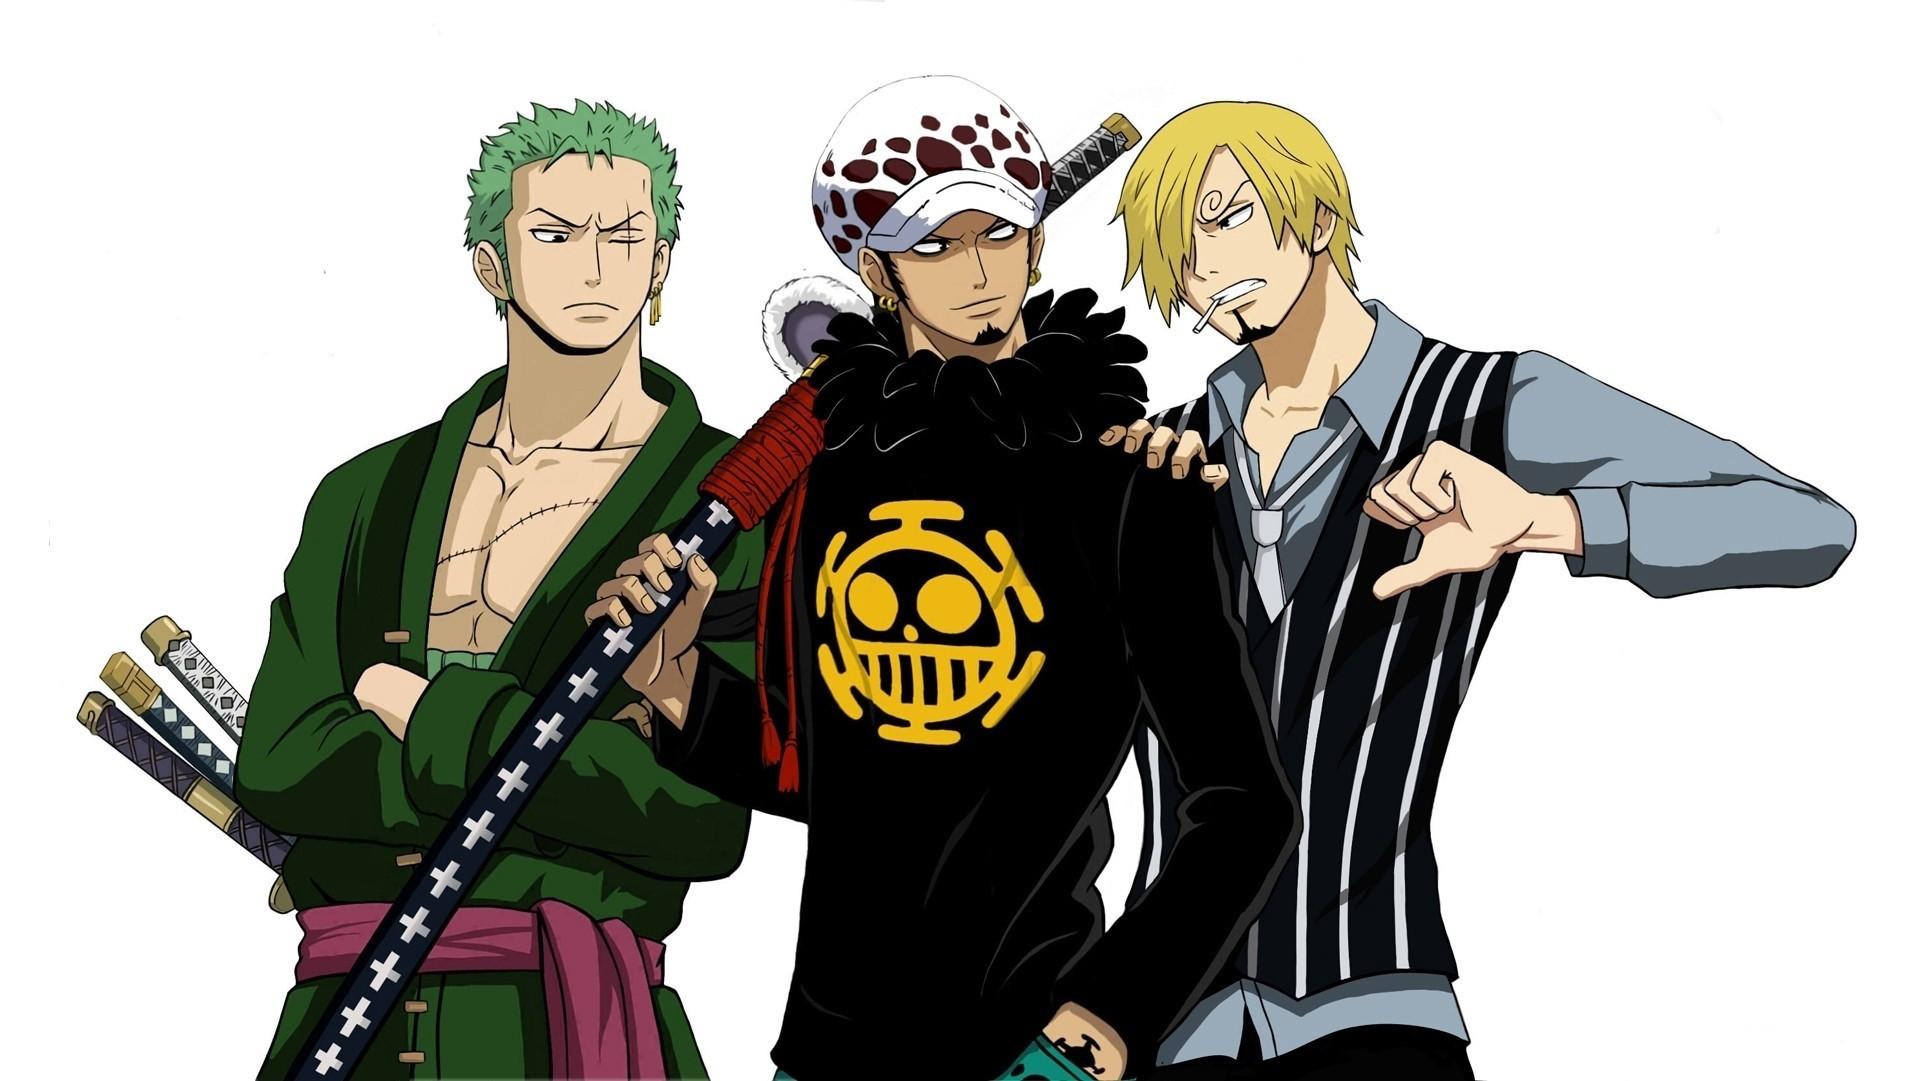 1920x1200 Mihawk Crocodile Doflamingo Wallpaper Hd Chibi One Piece Anime